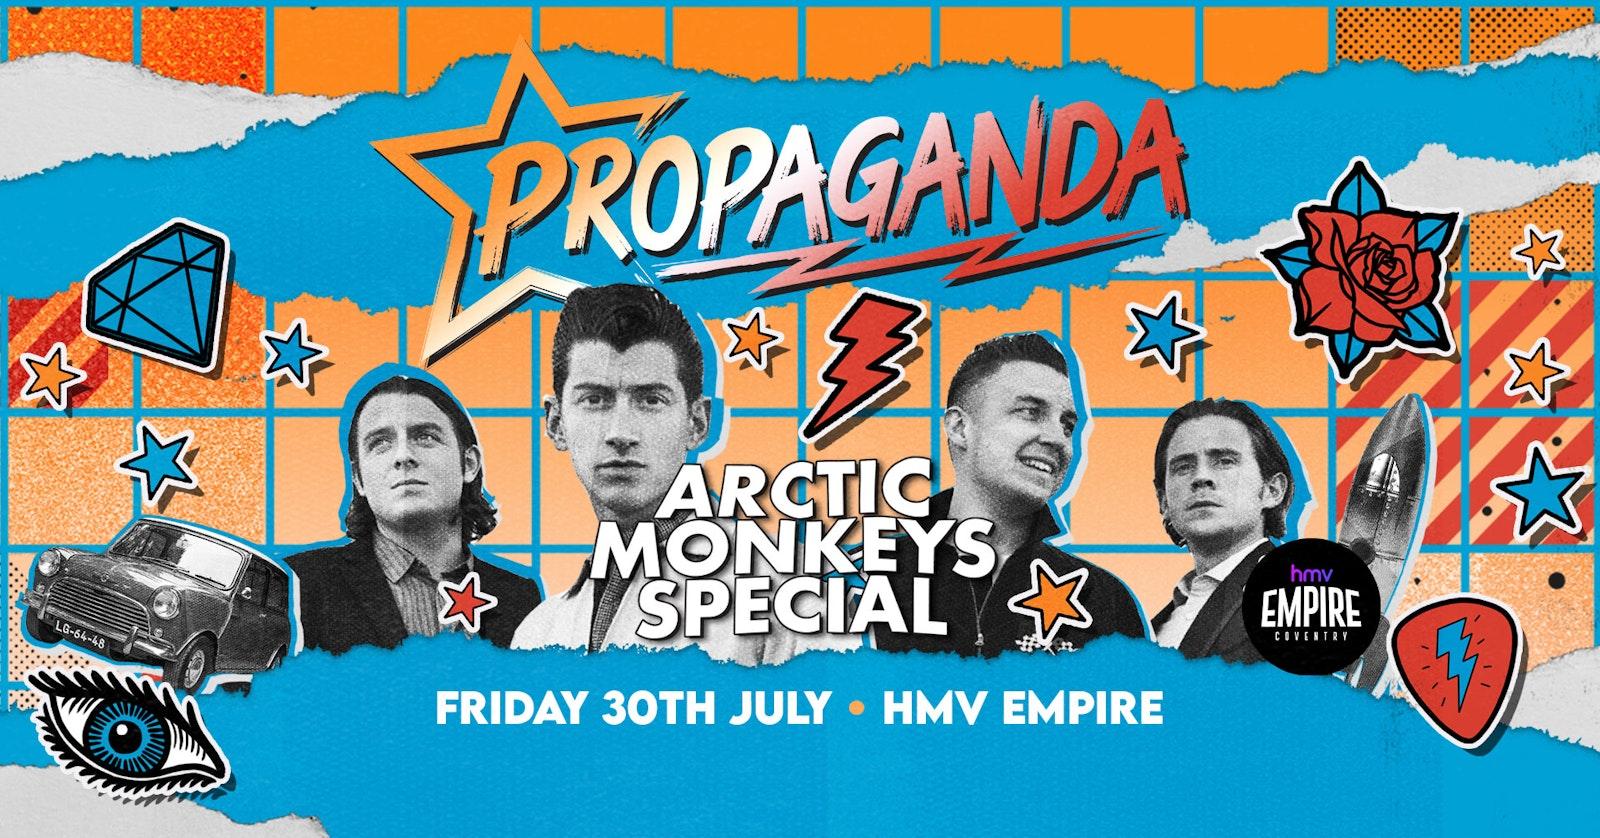 Propaganda Coventry – Arctic Monkeys Special!